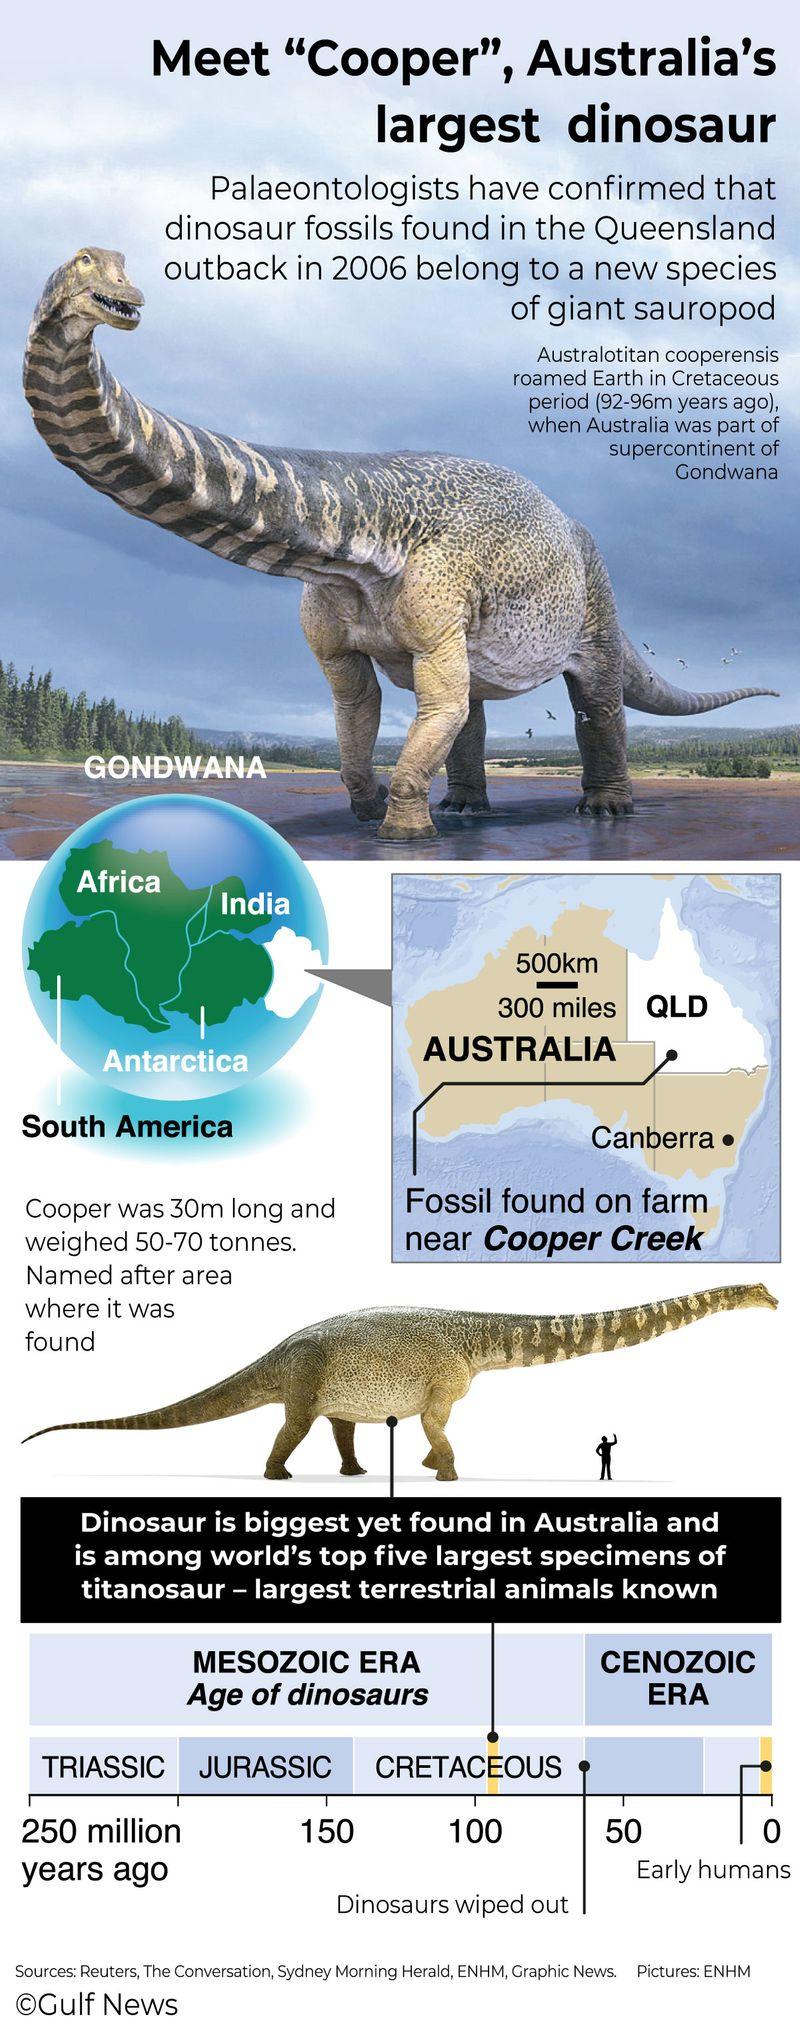 Meet 'Cooper', Australia's largest dinosaur